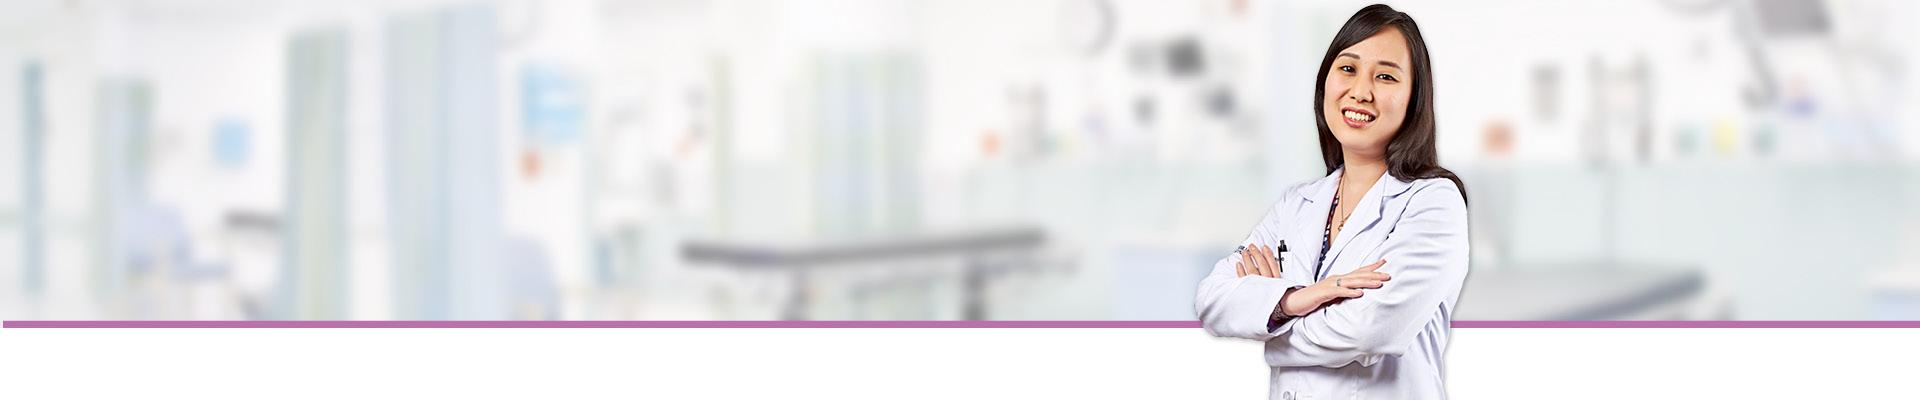 Banner 14 blank transfusao de hemocomponentes